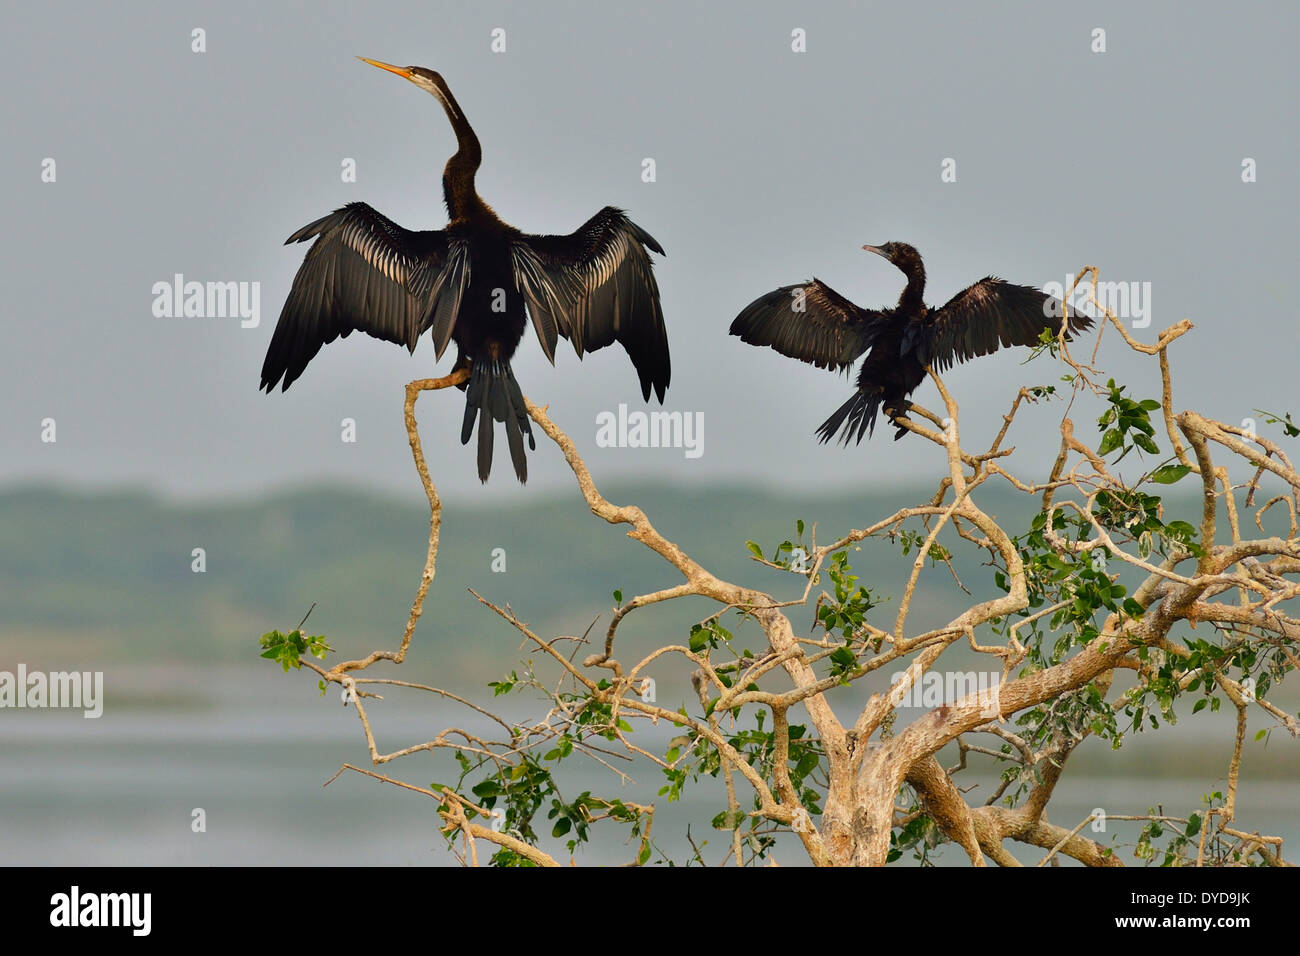 Oriental Darter or Indian Darter (Anhinga melanogaster) and a Little Cormorant (Phalacrocorax niger), Bundala National Park - Stock Image